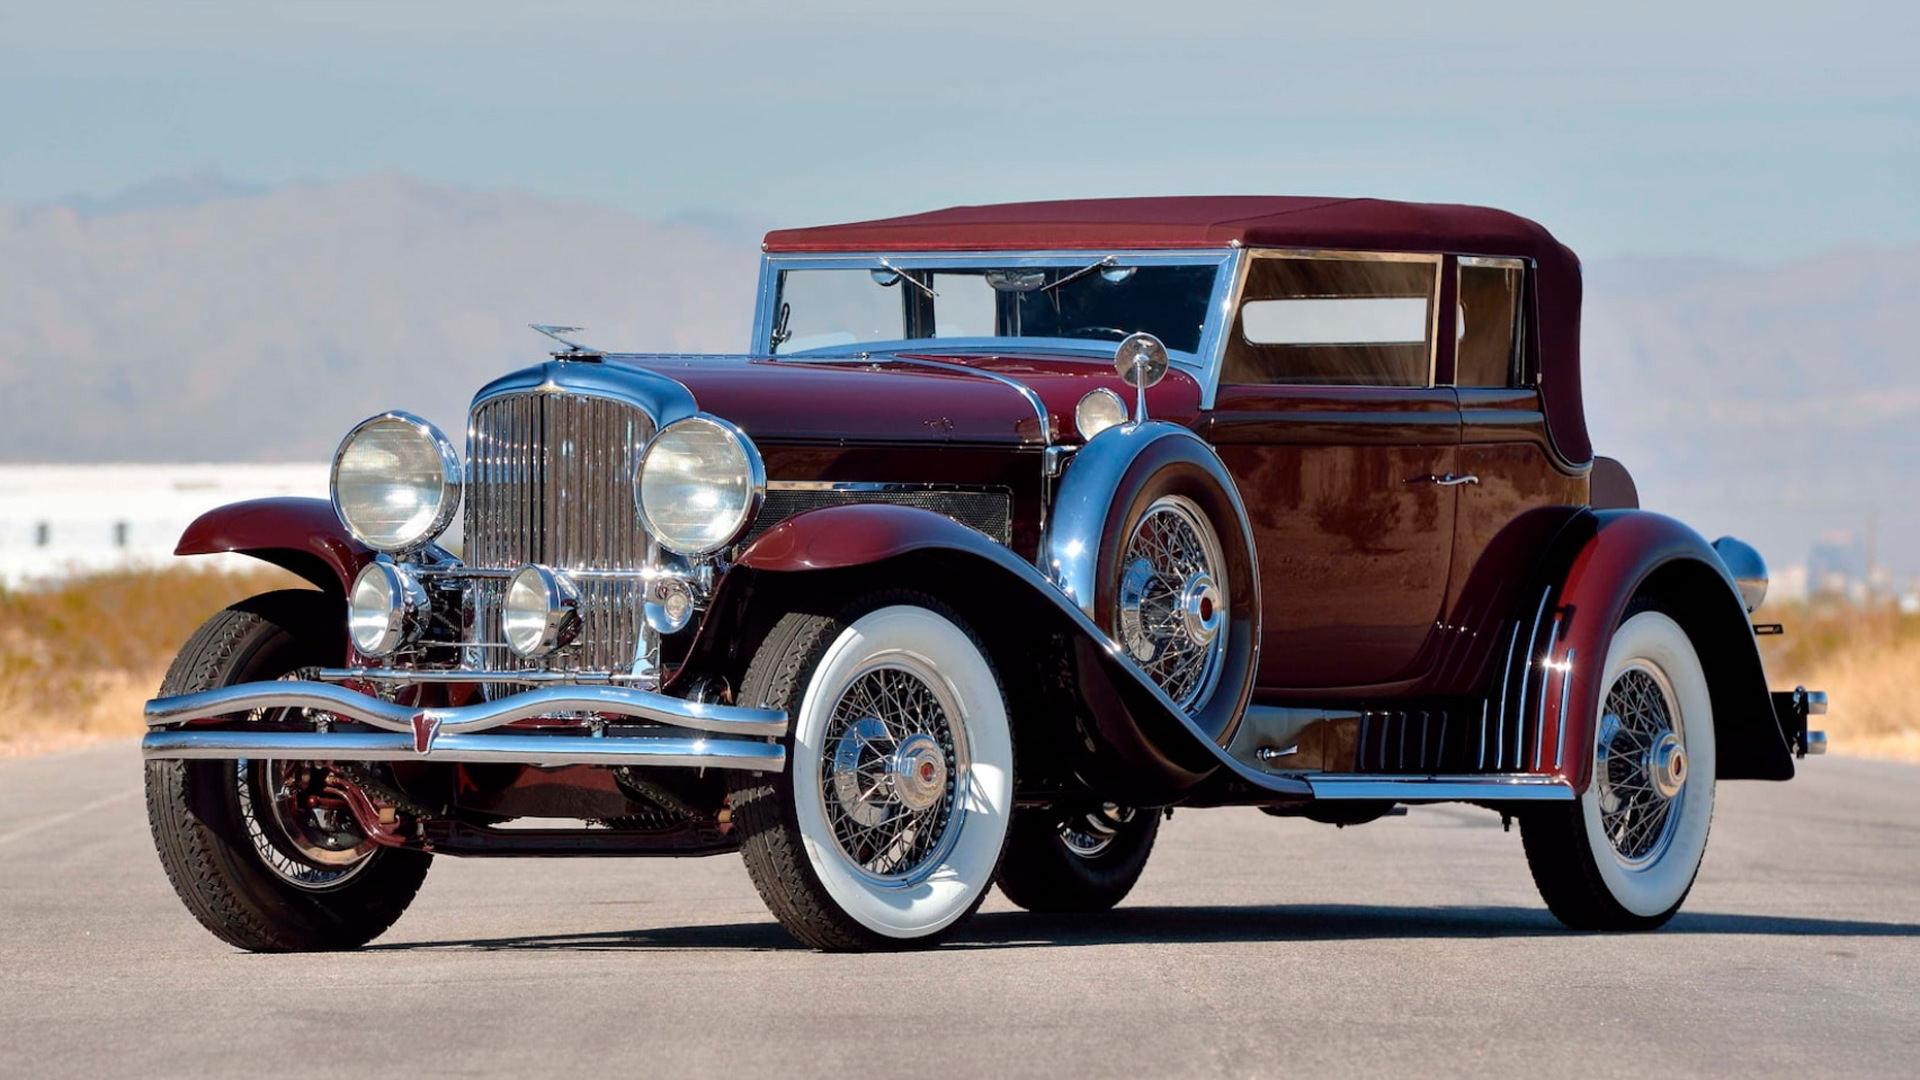 1930 Duesenberg Model SJ Rollston Convertible Victoria - Image via Mecum